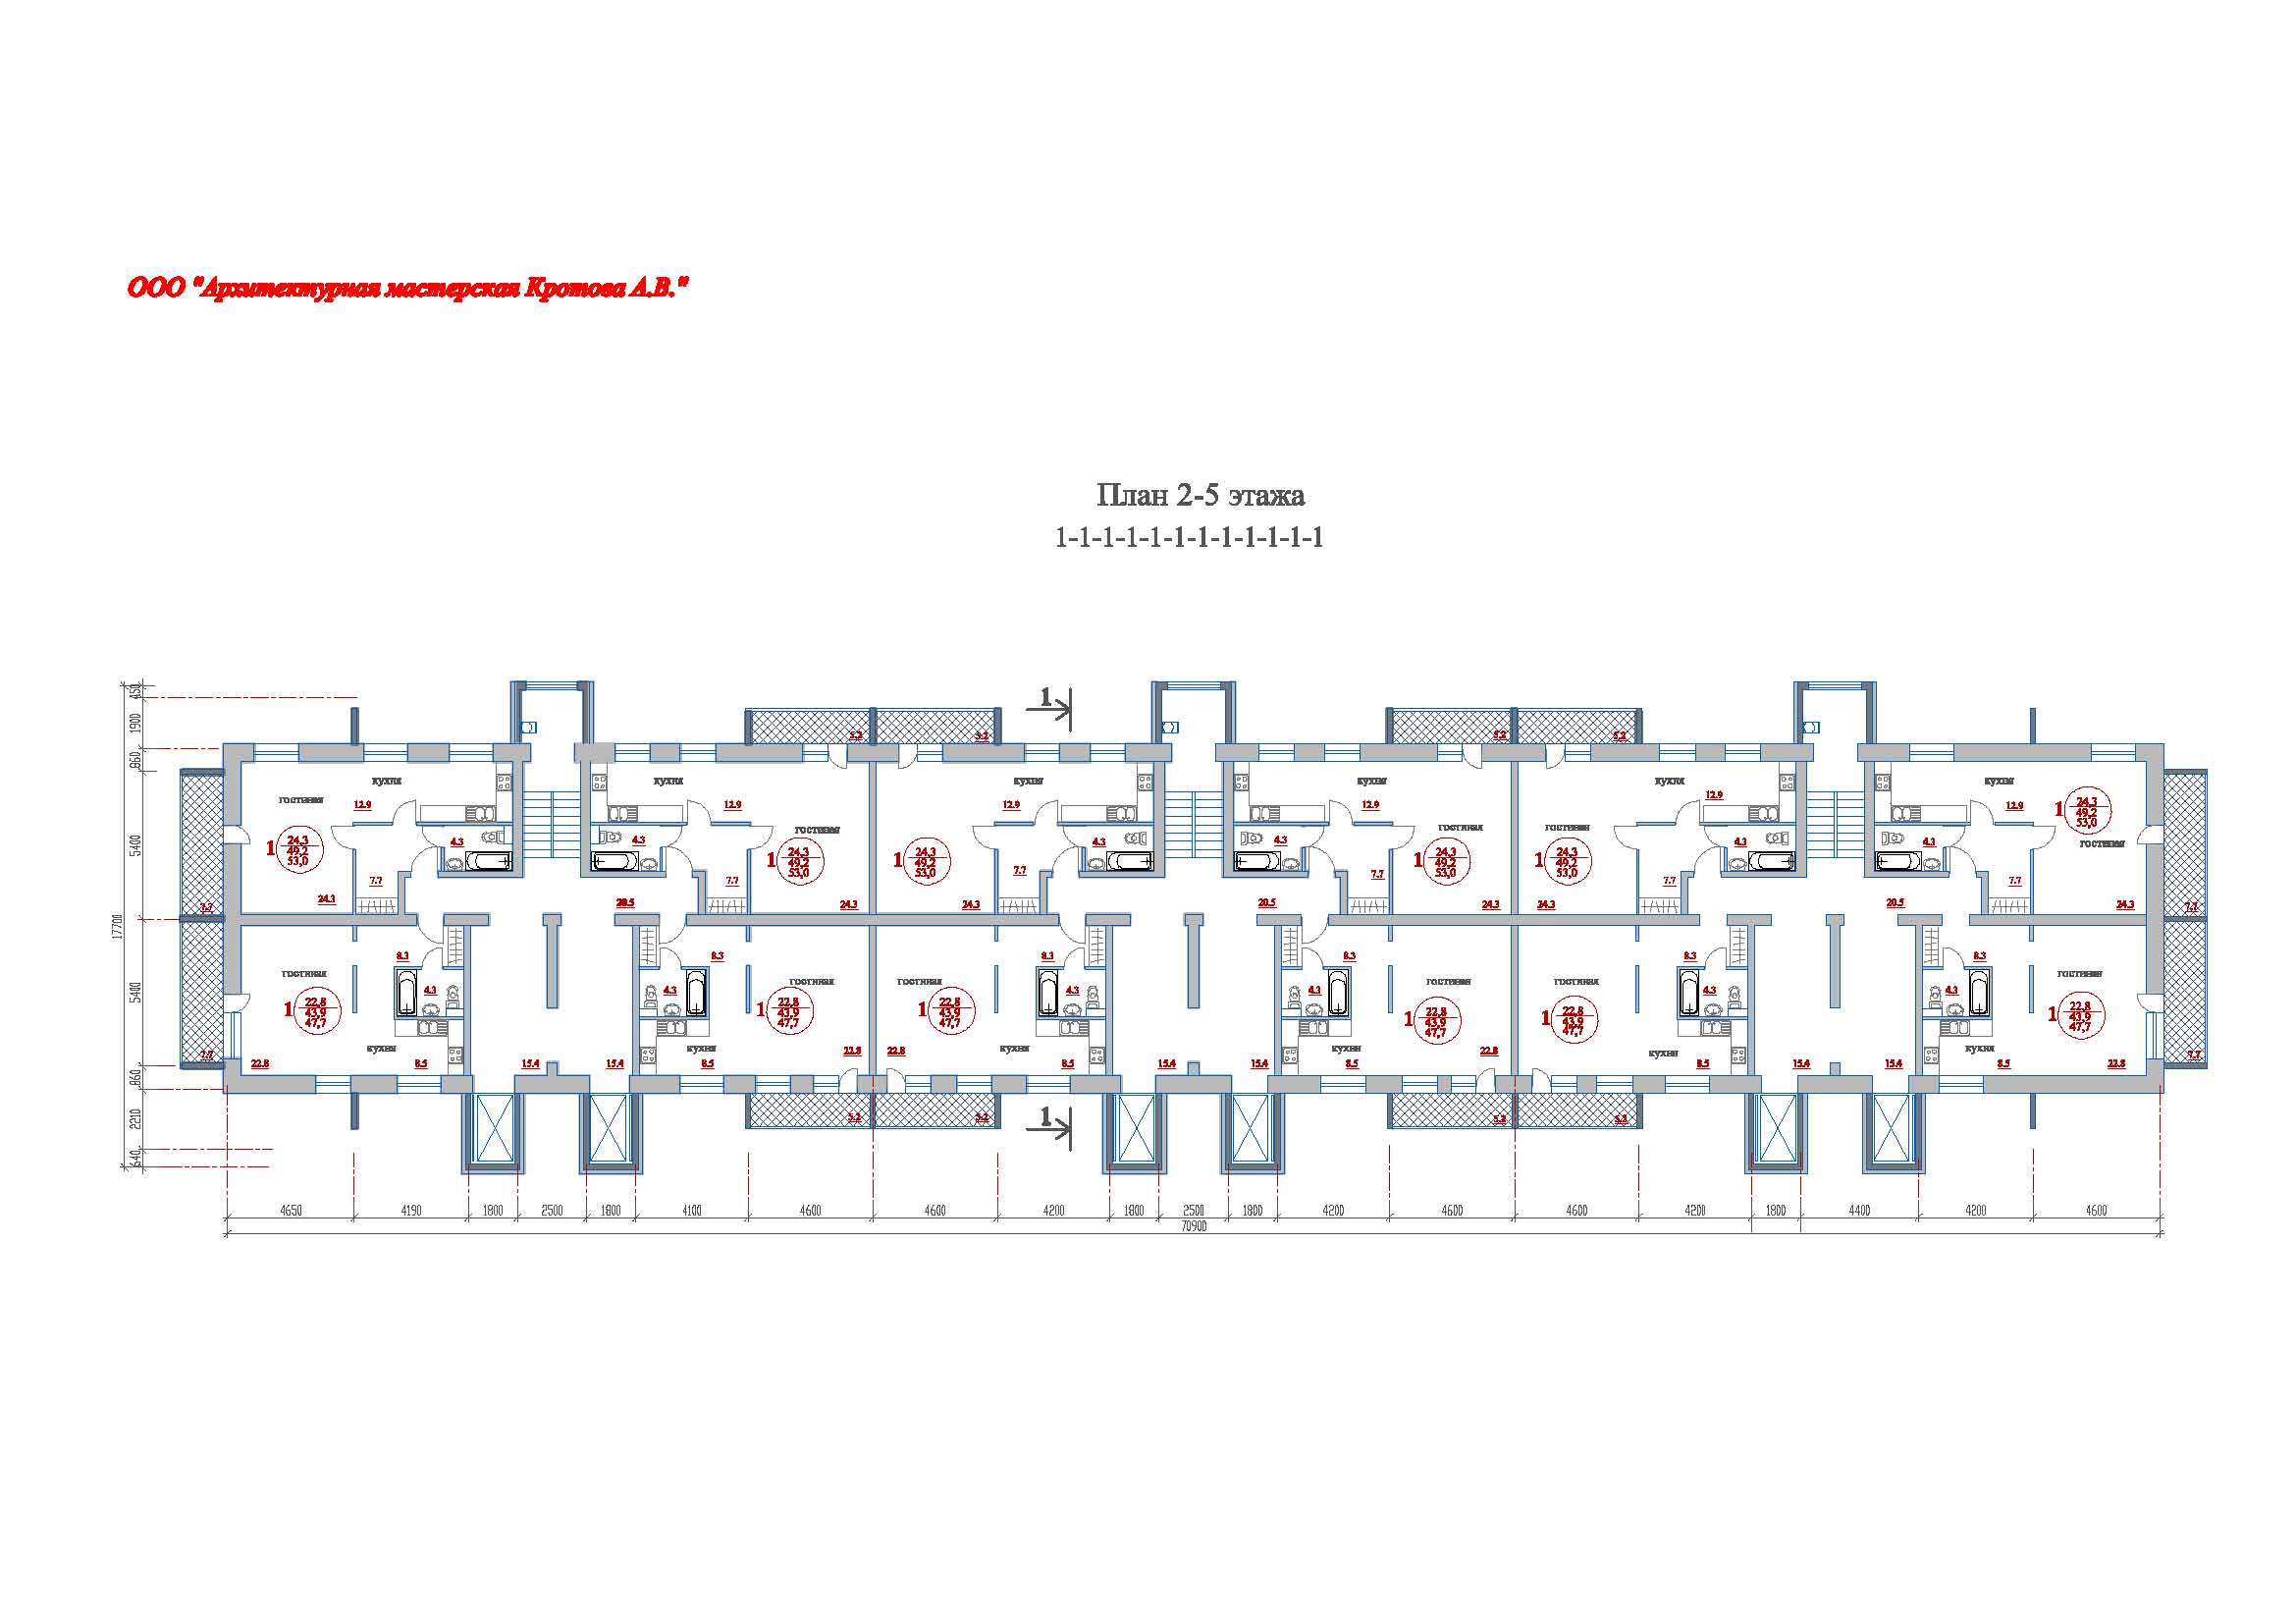 Реконструкция жмлых пятиэтажек